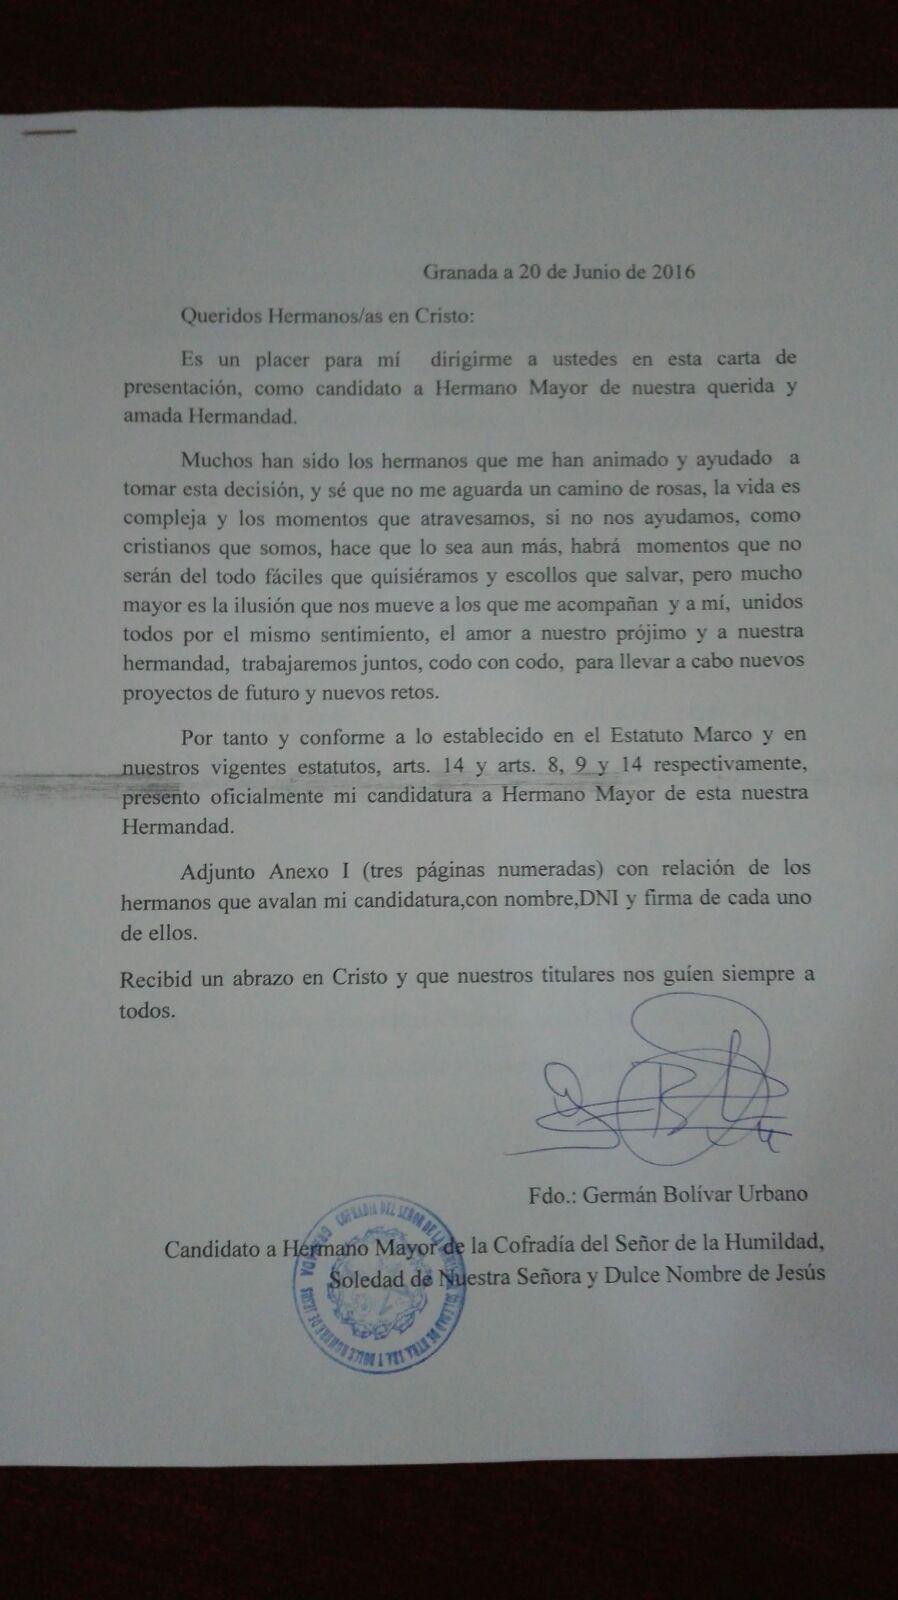 Carta German Bolivar Urbano